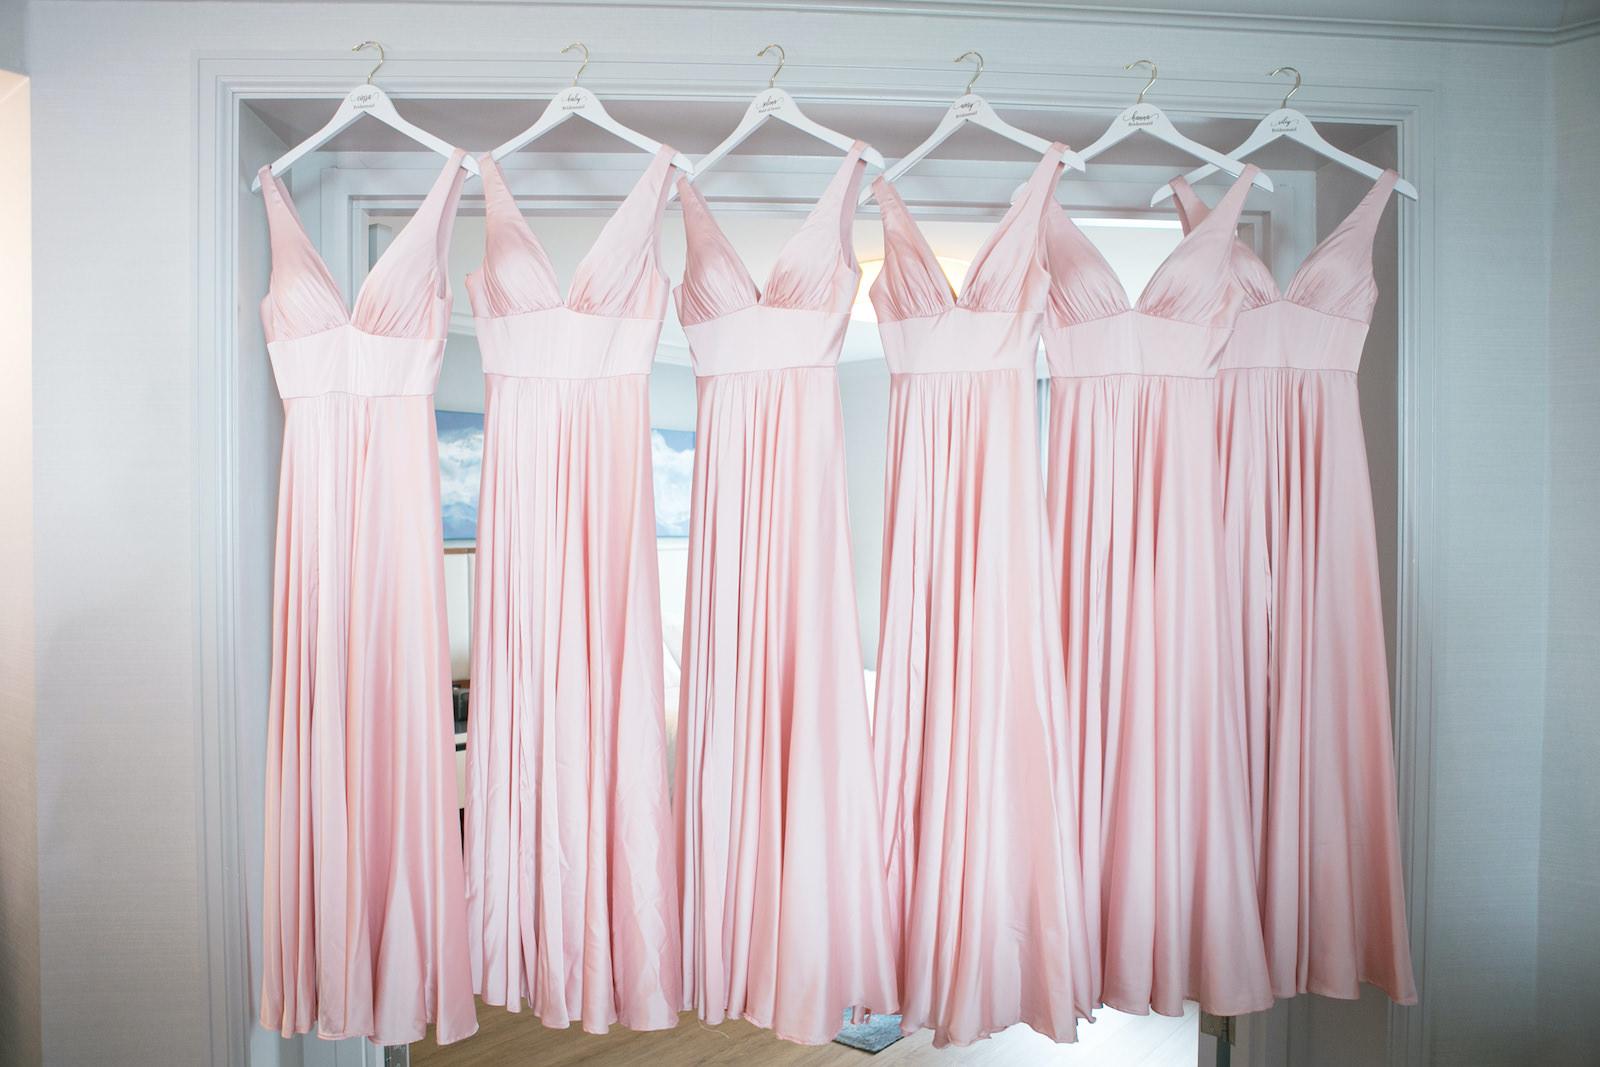 Bridesmaids Dresses Hanger Shot   Blush Pink Long Silk Satin Formal V Neck Bridesmaid Dresses